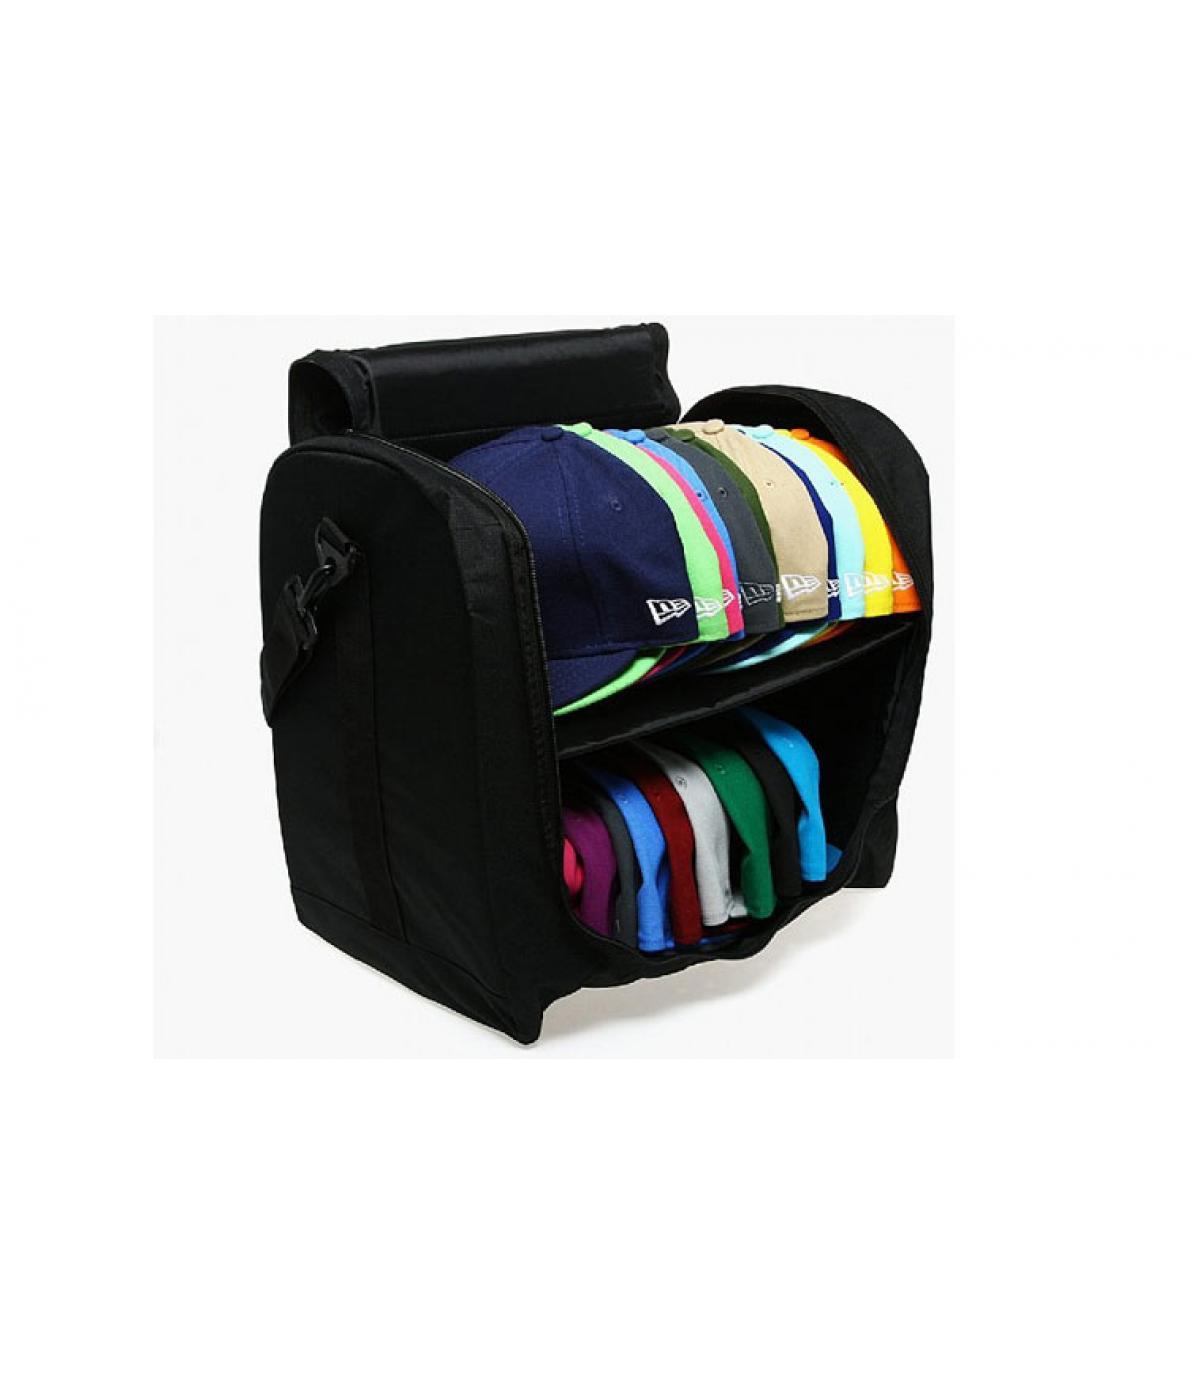 cap carry case